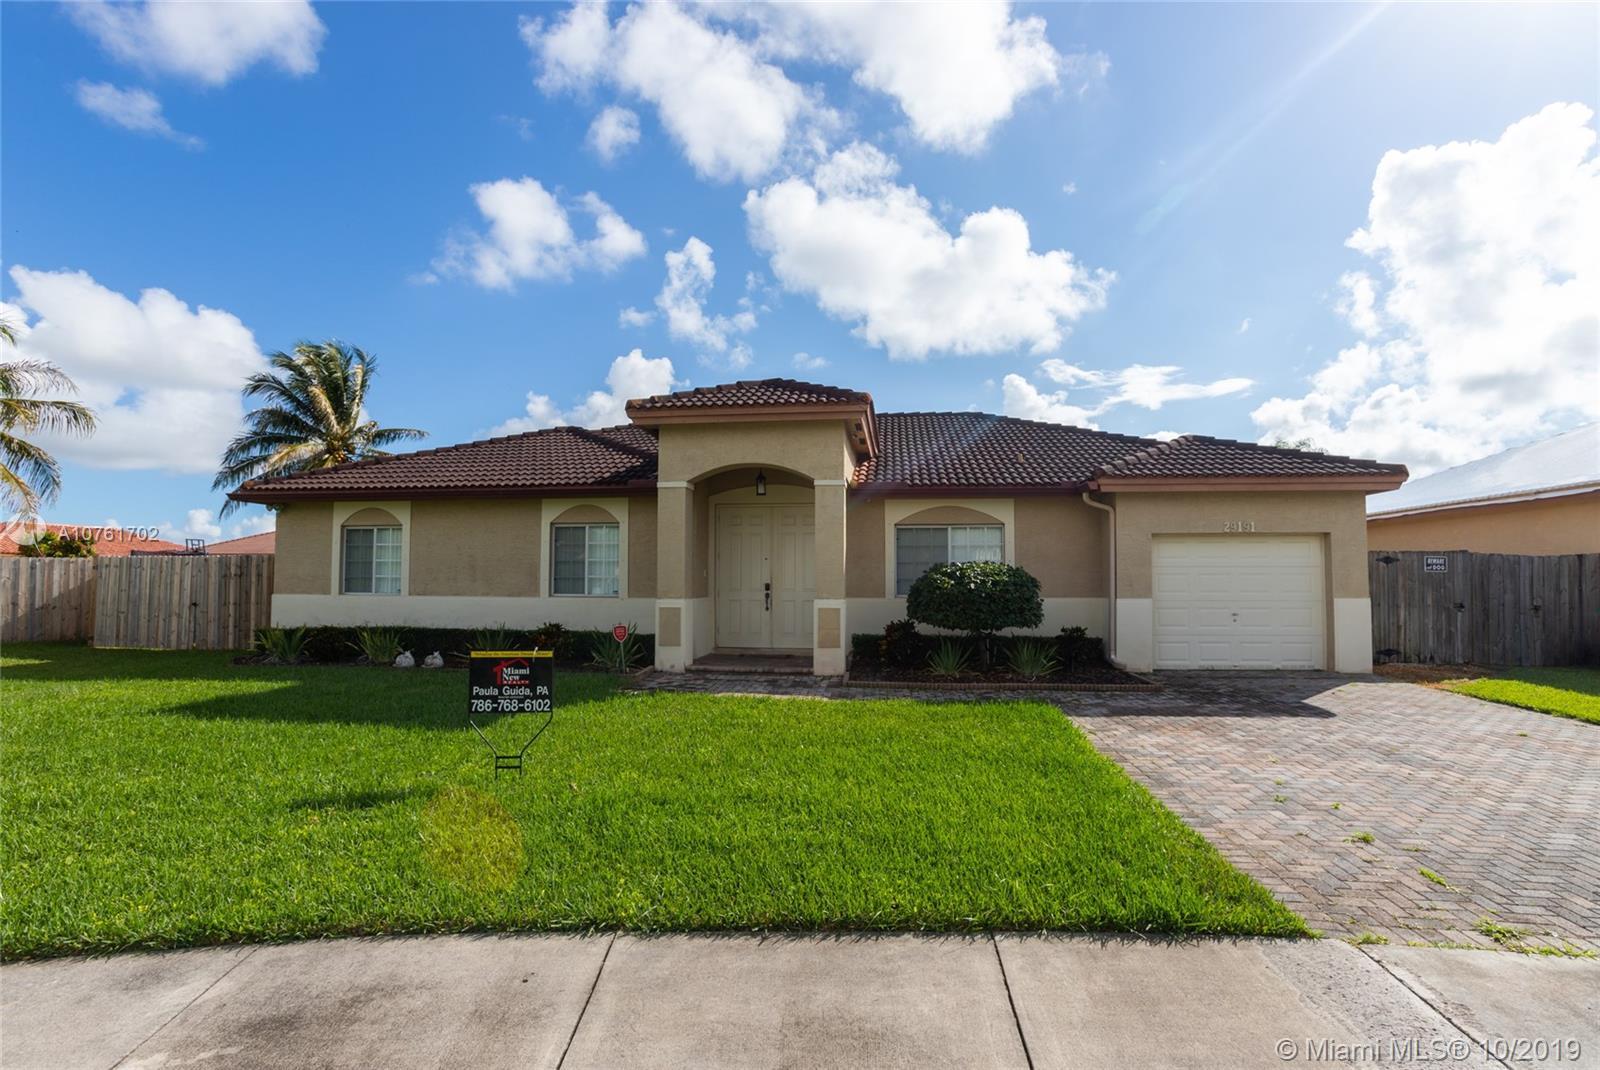 29191 SW 142nd Ct, Homestead, FL 33033 - Homestead, FL real estate listing